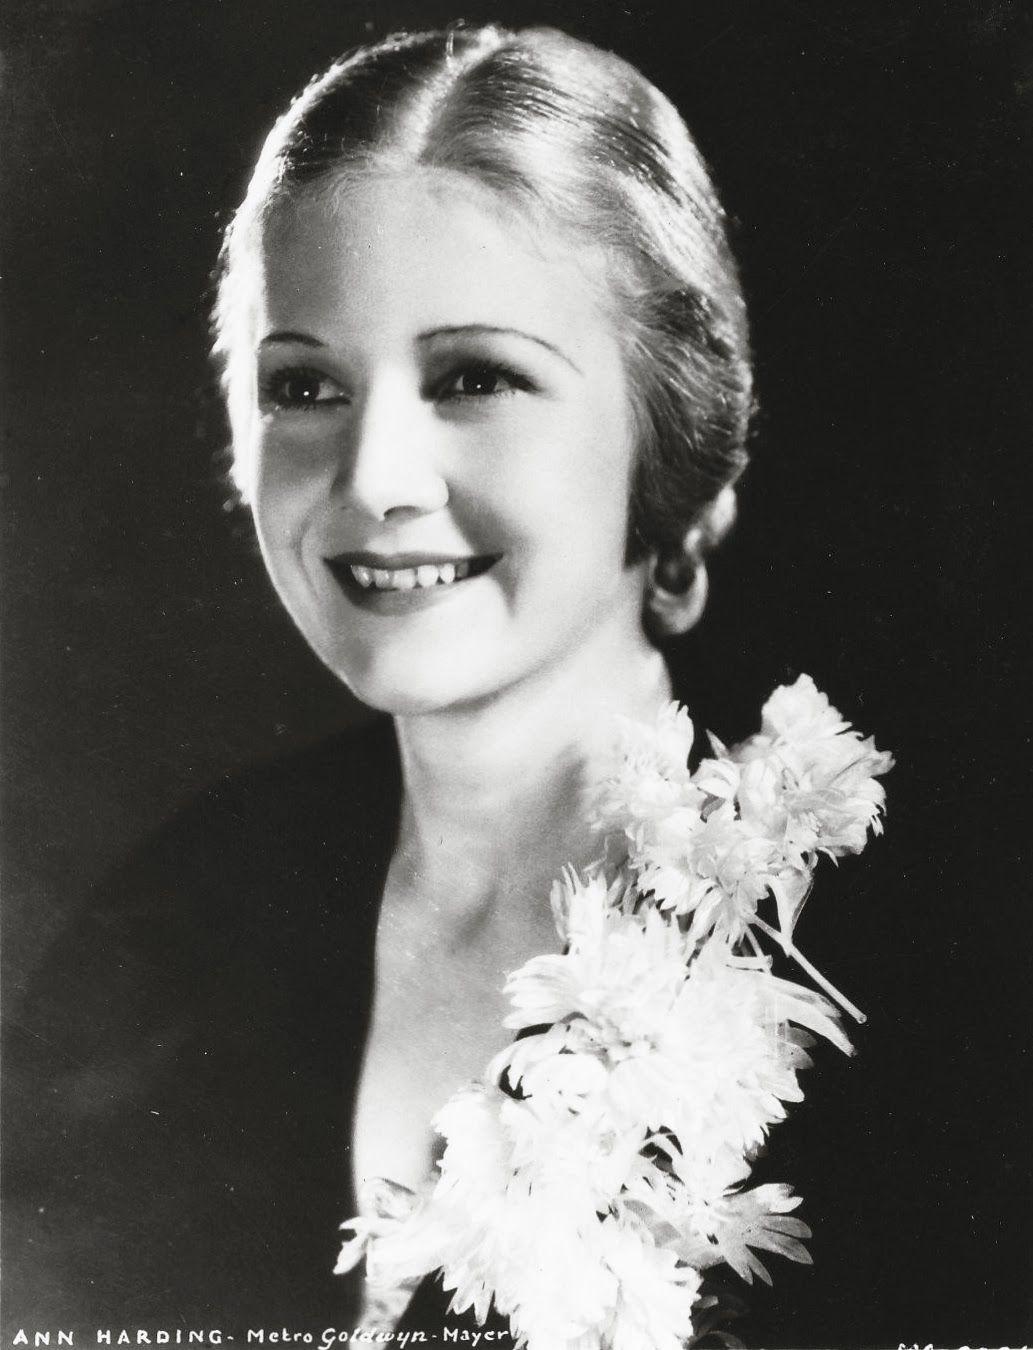 Nori Dalisay (b. 1938)